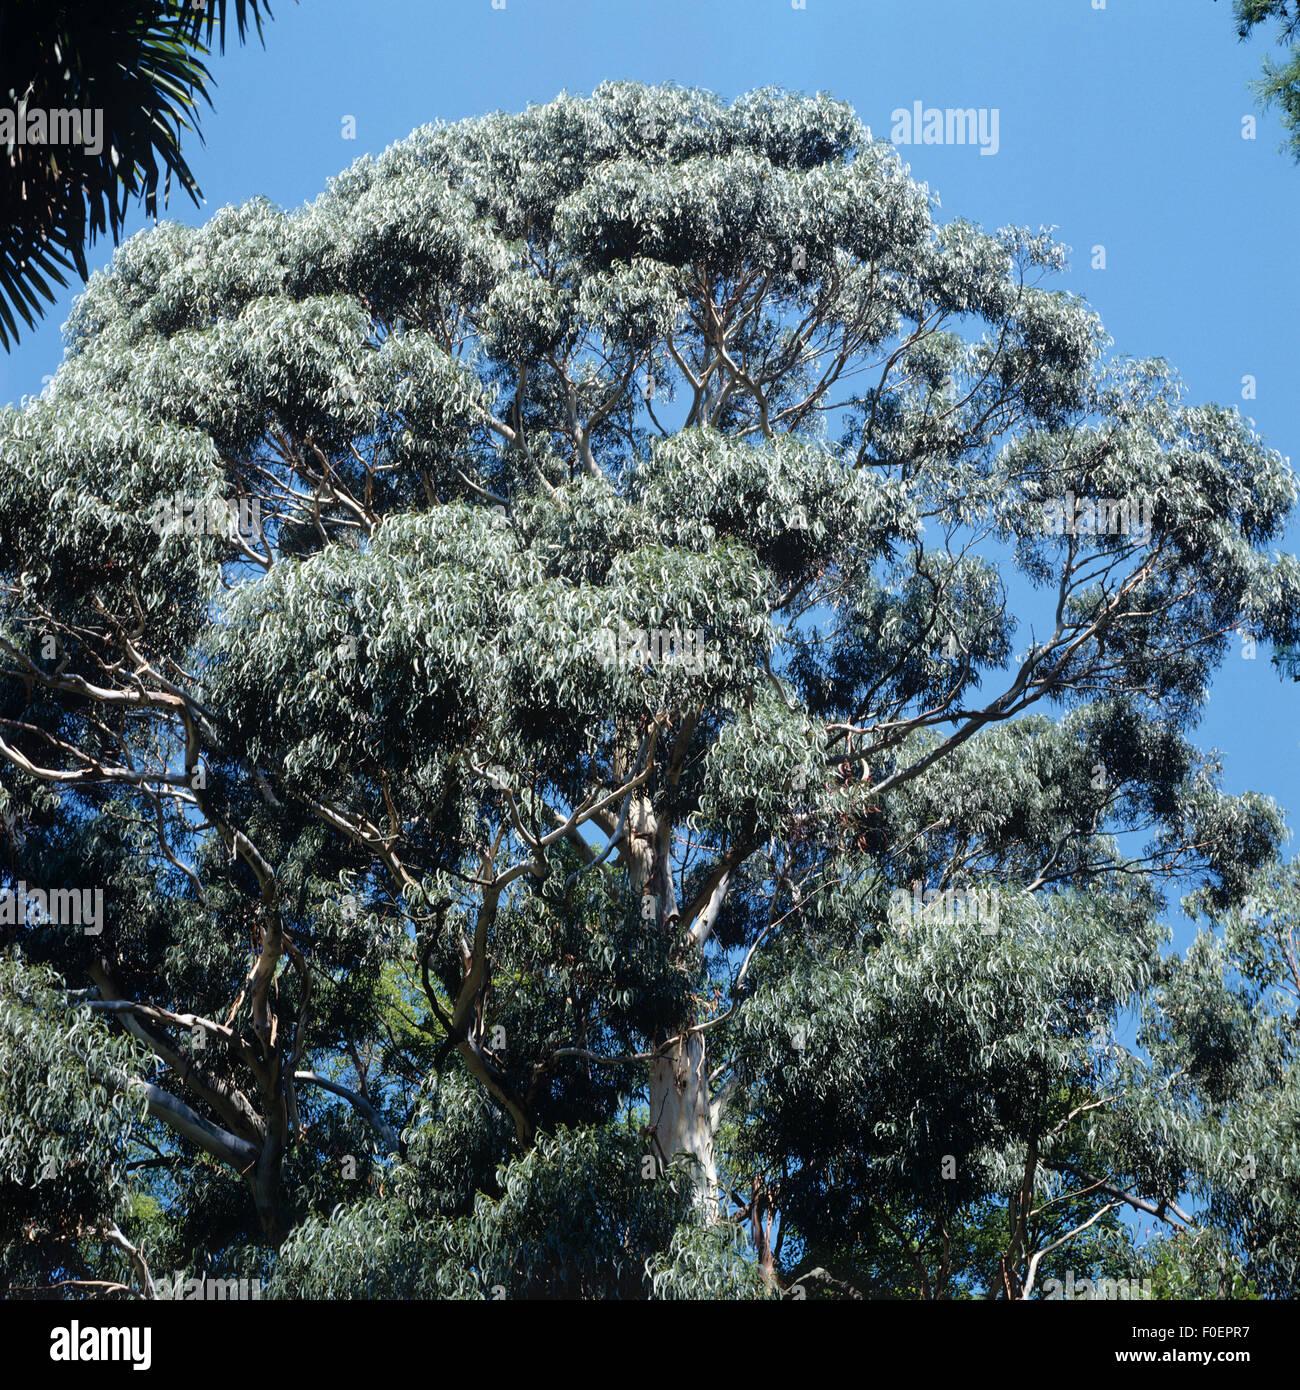 eucalyptus baum stockfotos eucalyptus baum bilder alamy. Black Bedroom Furniture Sets. Home Design Ideas